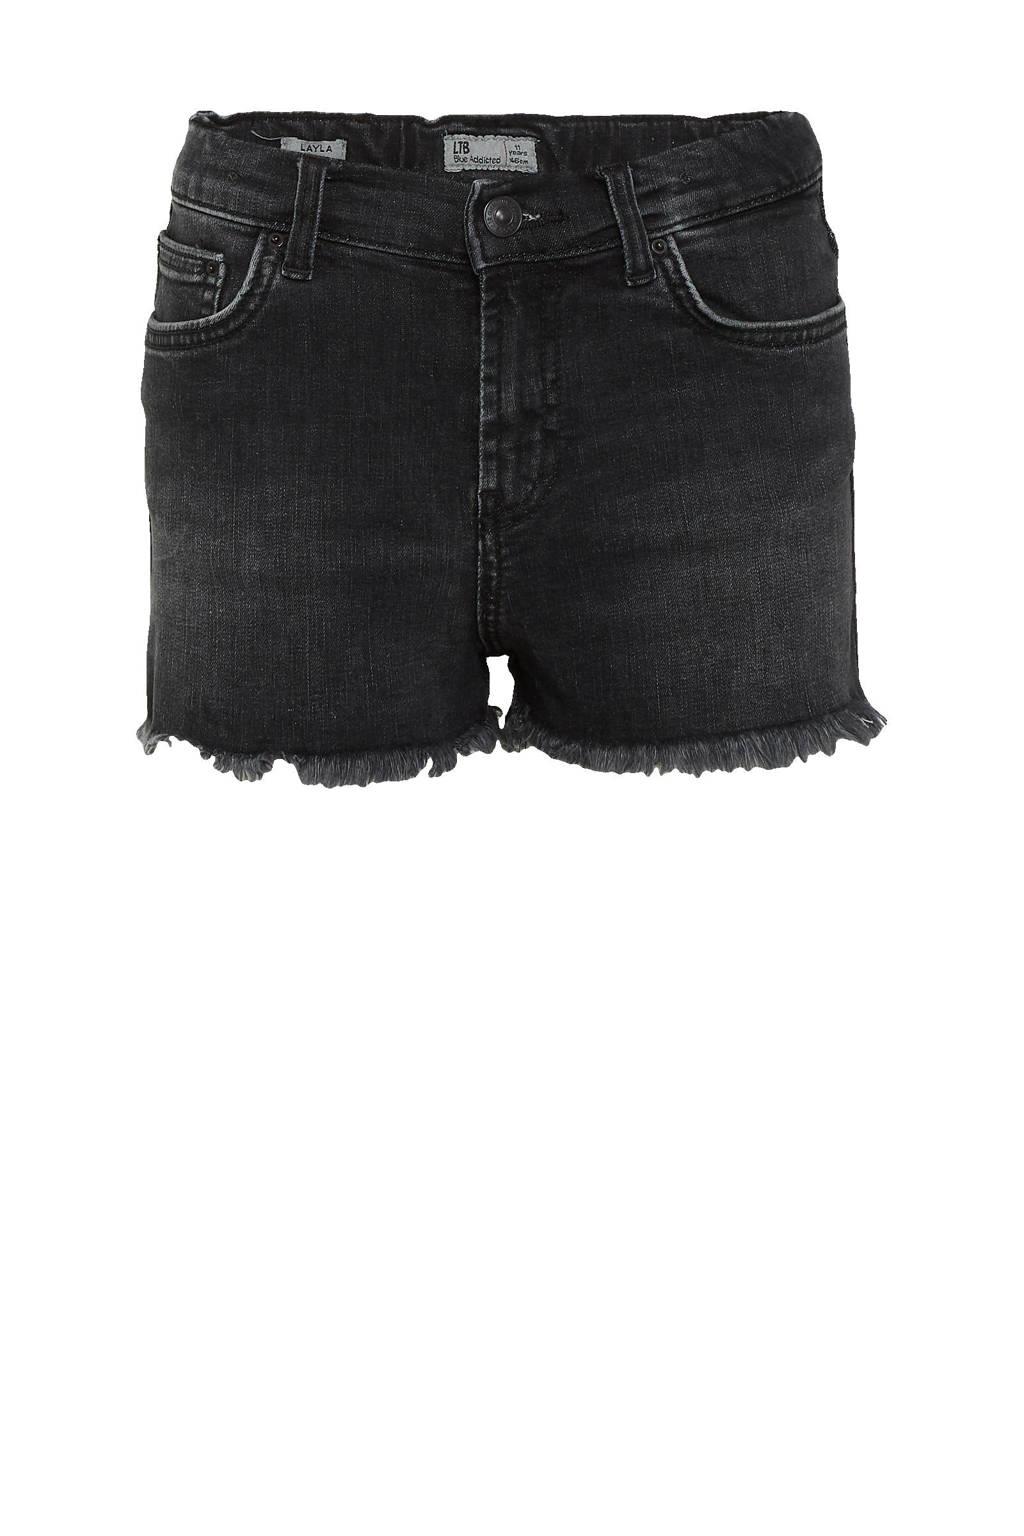 LTB high waist slim fit jeans short Layla dias undamaged wash, Dias undamaged wash